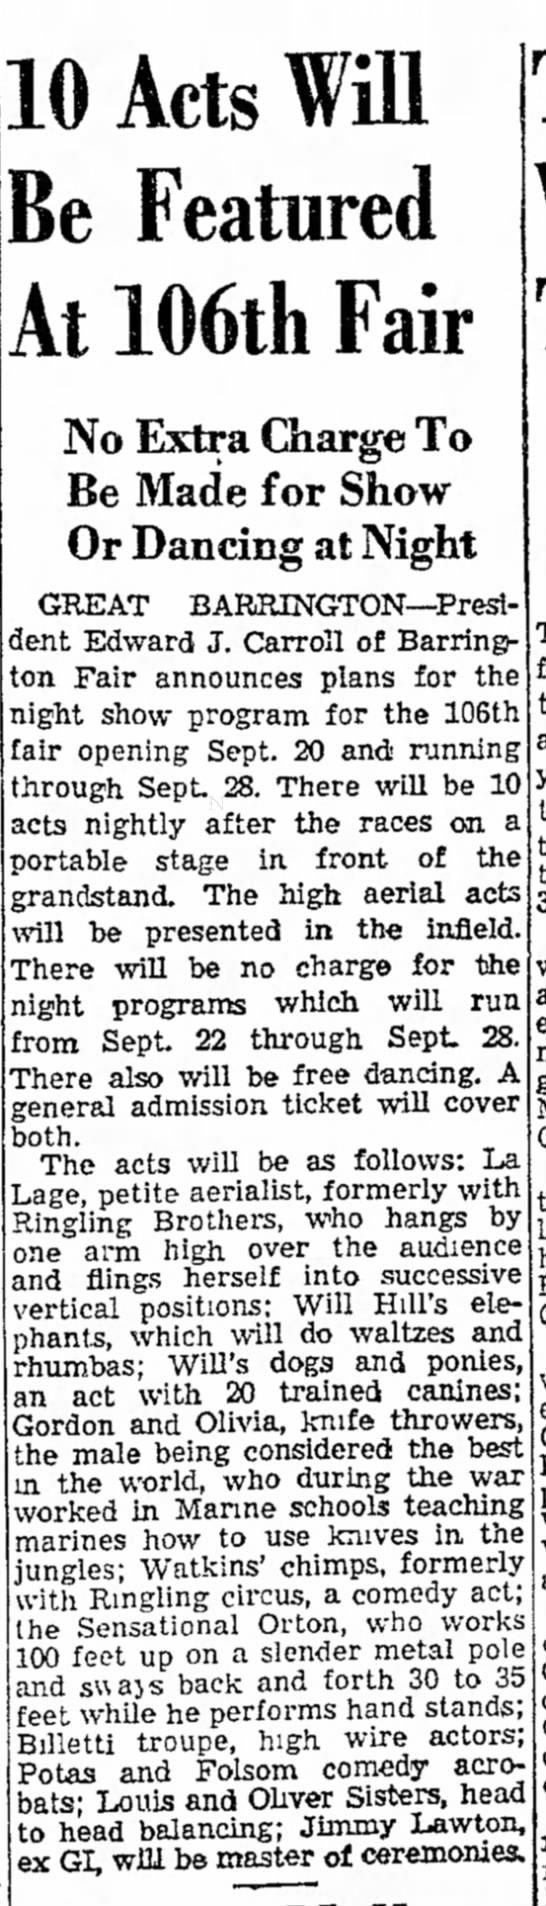 Billetti - Sept 11, 1947 The Berkshire Eagle - Pittsfield, MA -